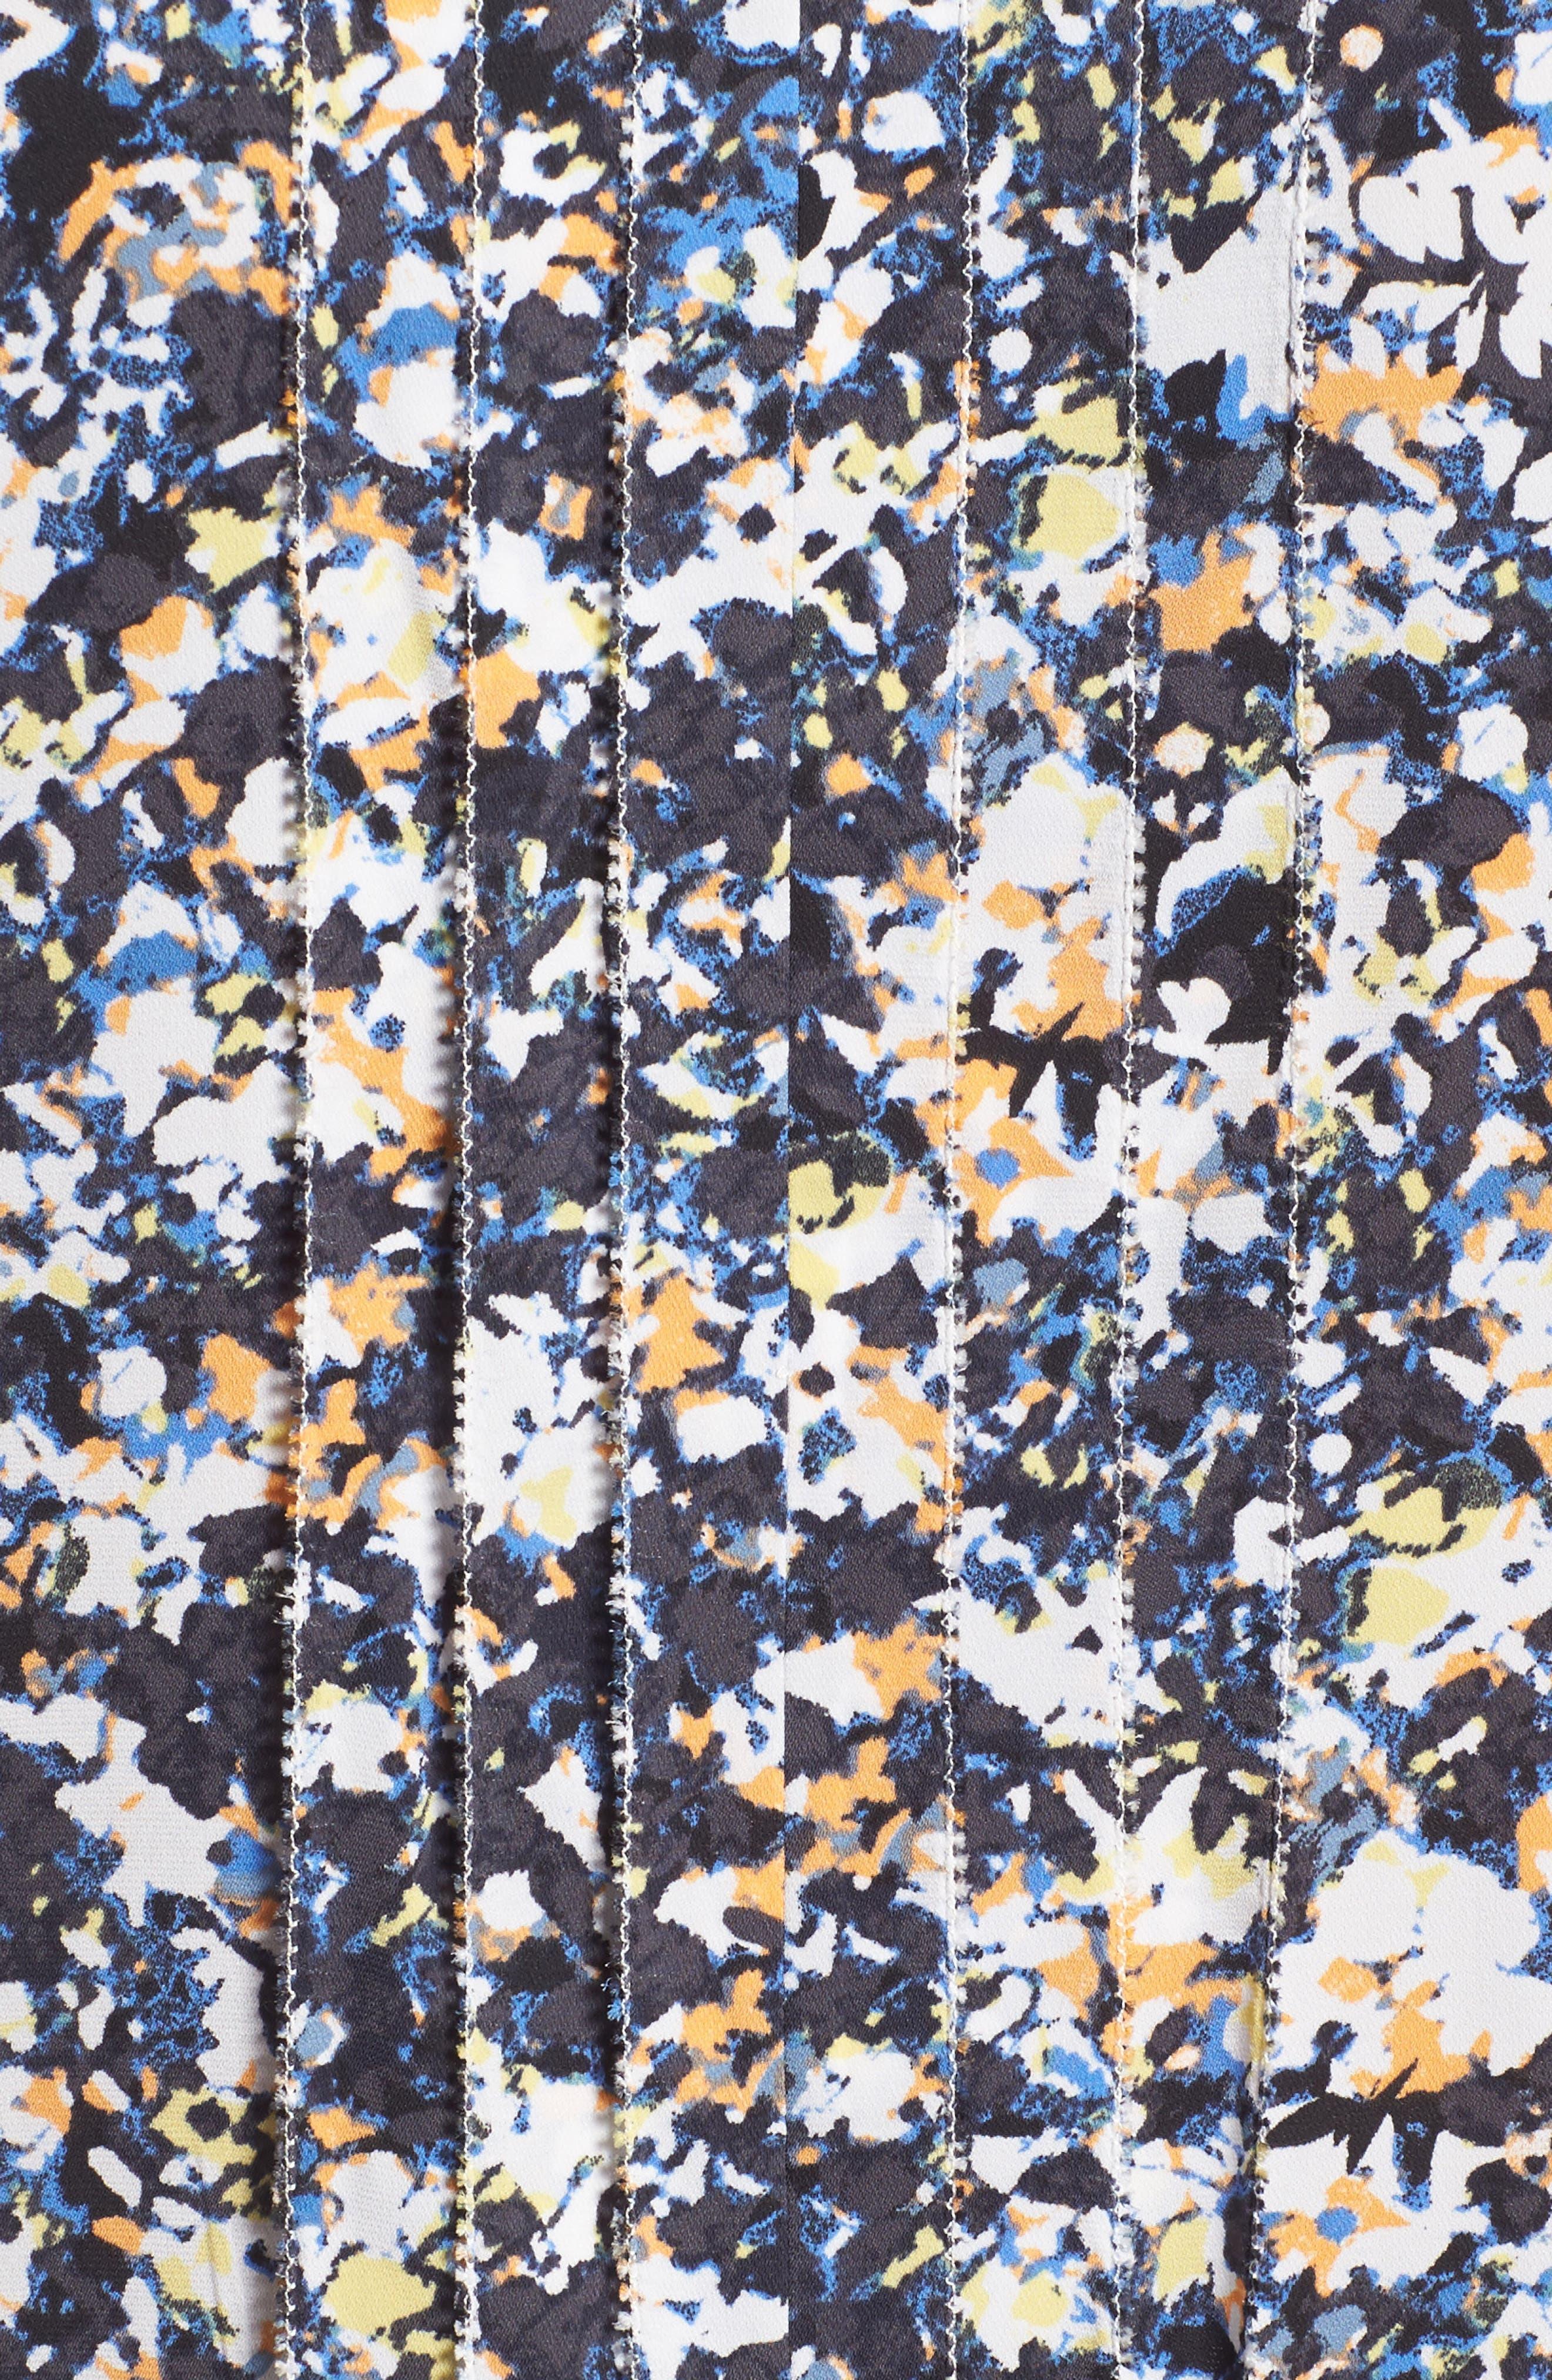 Picot Detail Silk Blend Blouse,                             Alternate thumbnail 5, color,                             Grey Multi Camo Floral